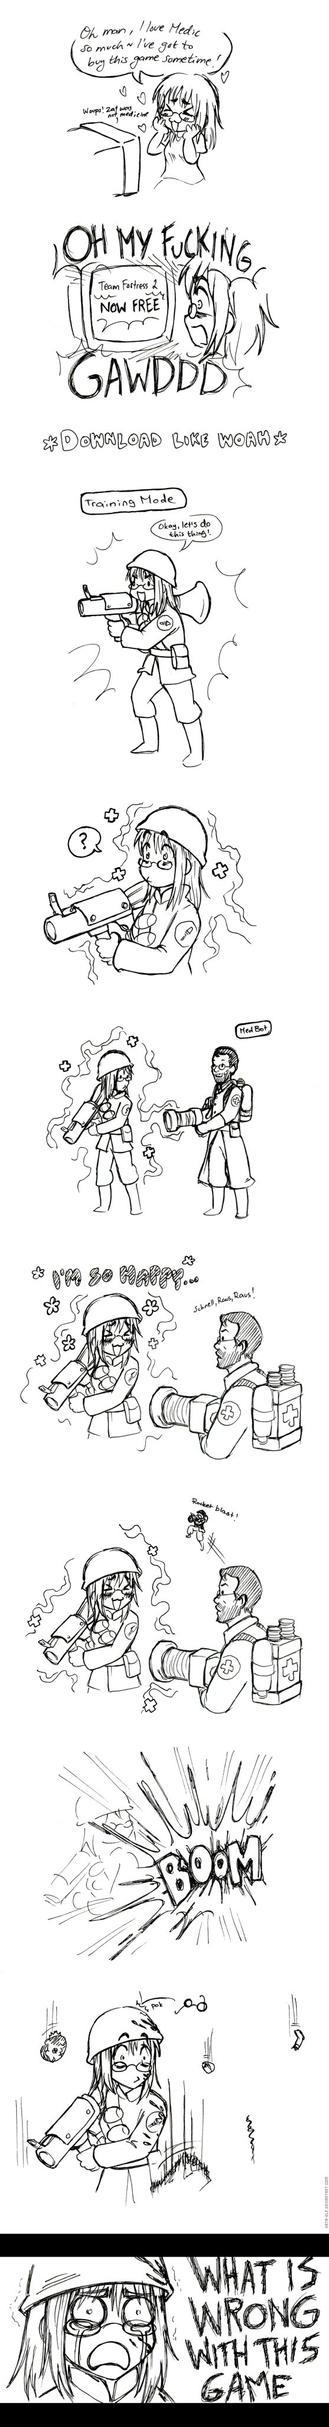 TF2: Adventures of a newbie by Kata-elf